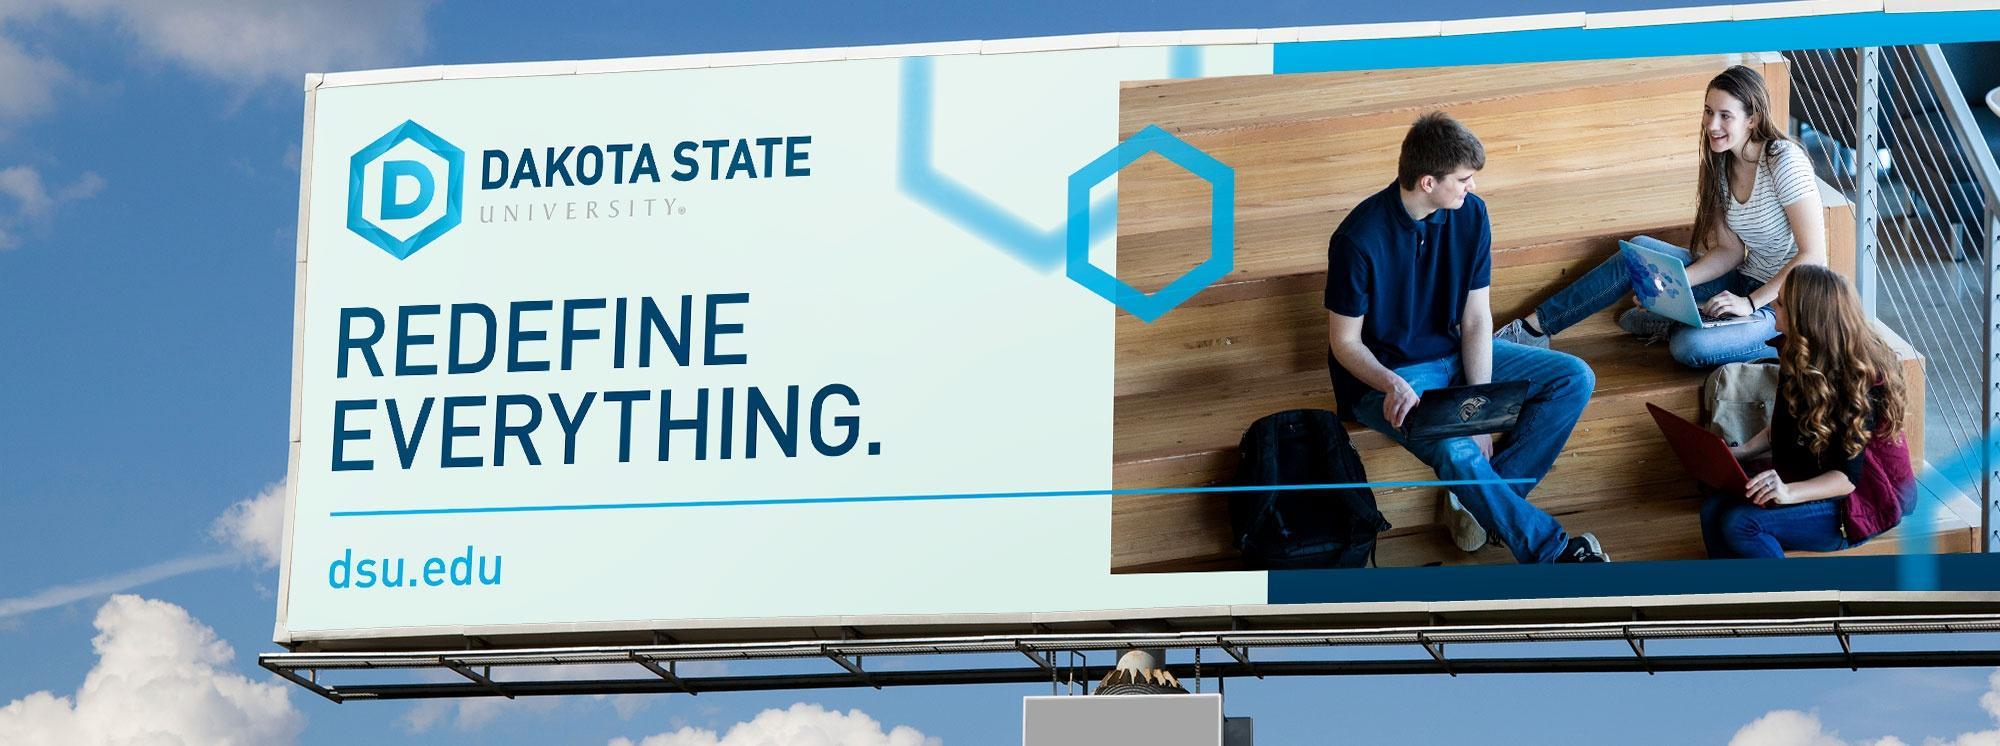 Dakota State University Rebrand